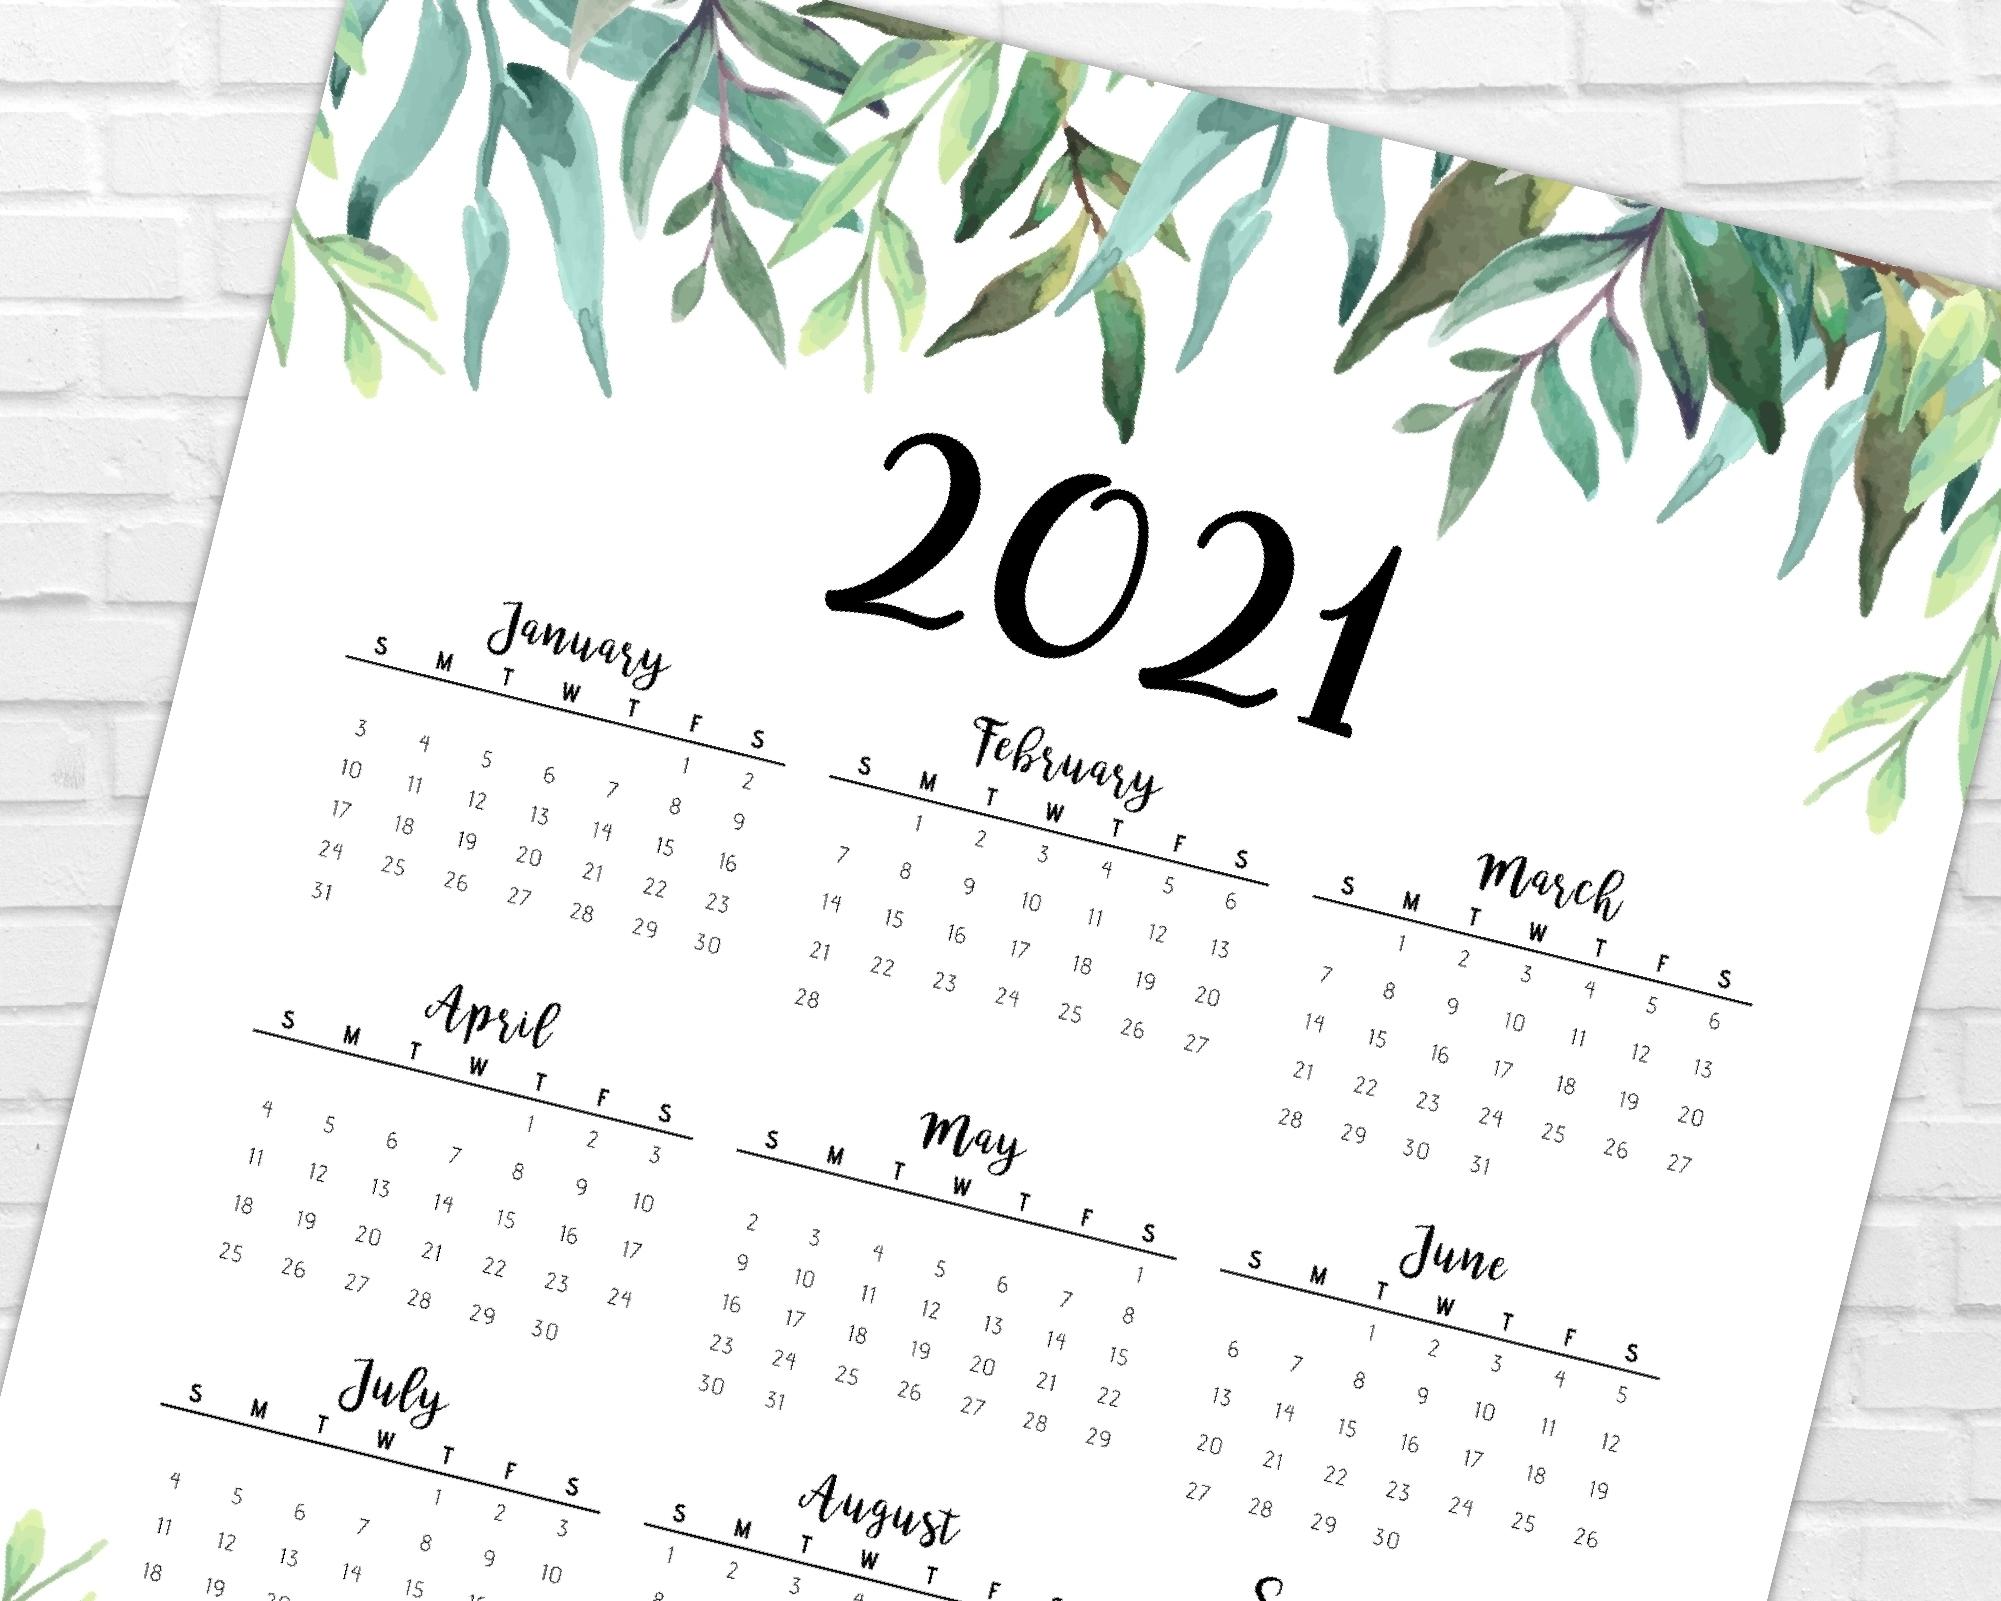 2021 Year At A Glance Calendar | Greenery & Leaves